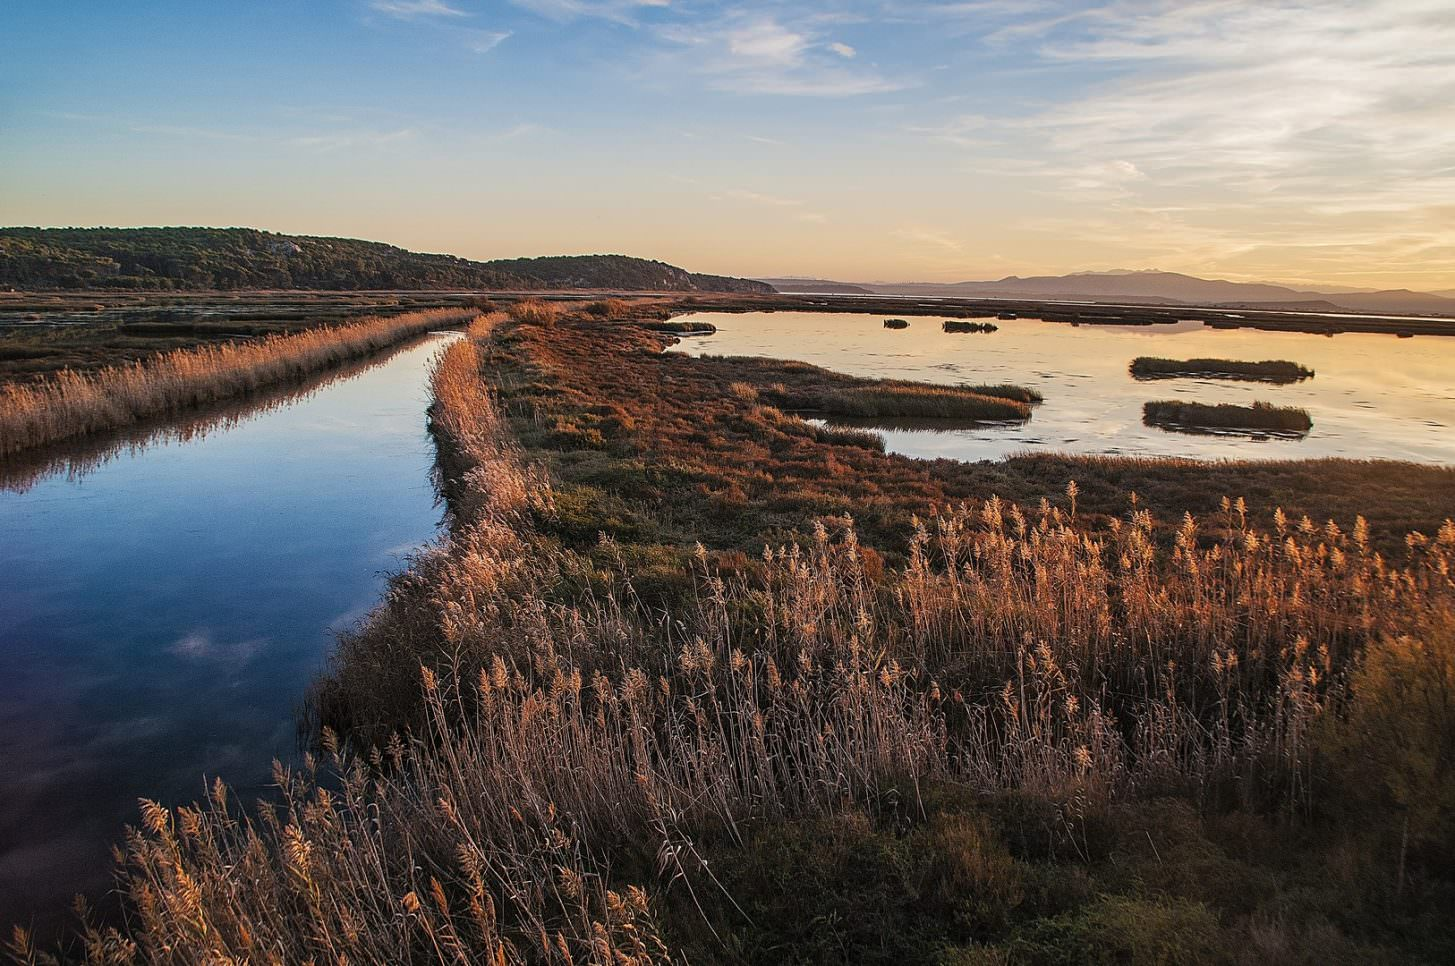 Balade sur l'étang de l'Ayrolle ©Edgard Depuy-ADT de l'Aude